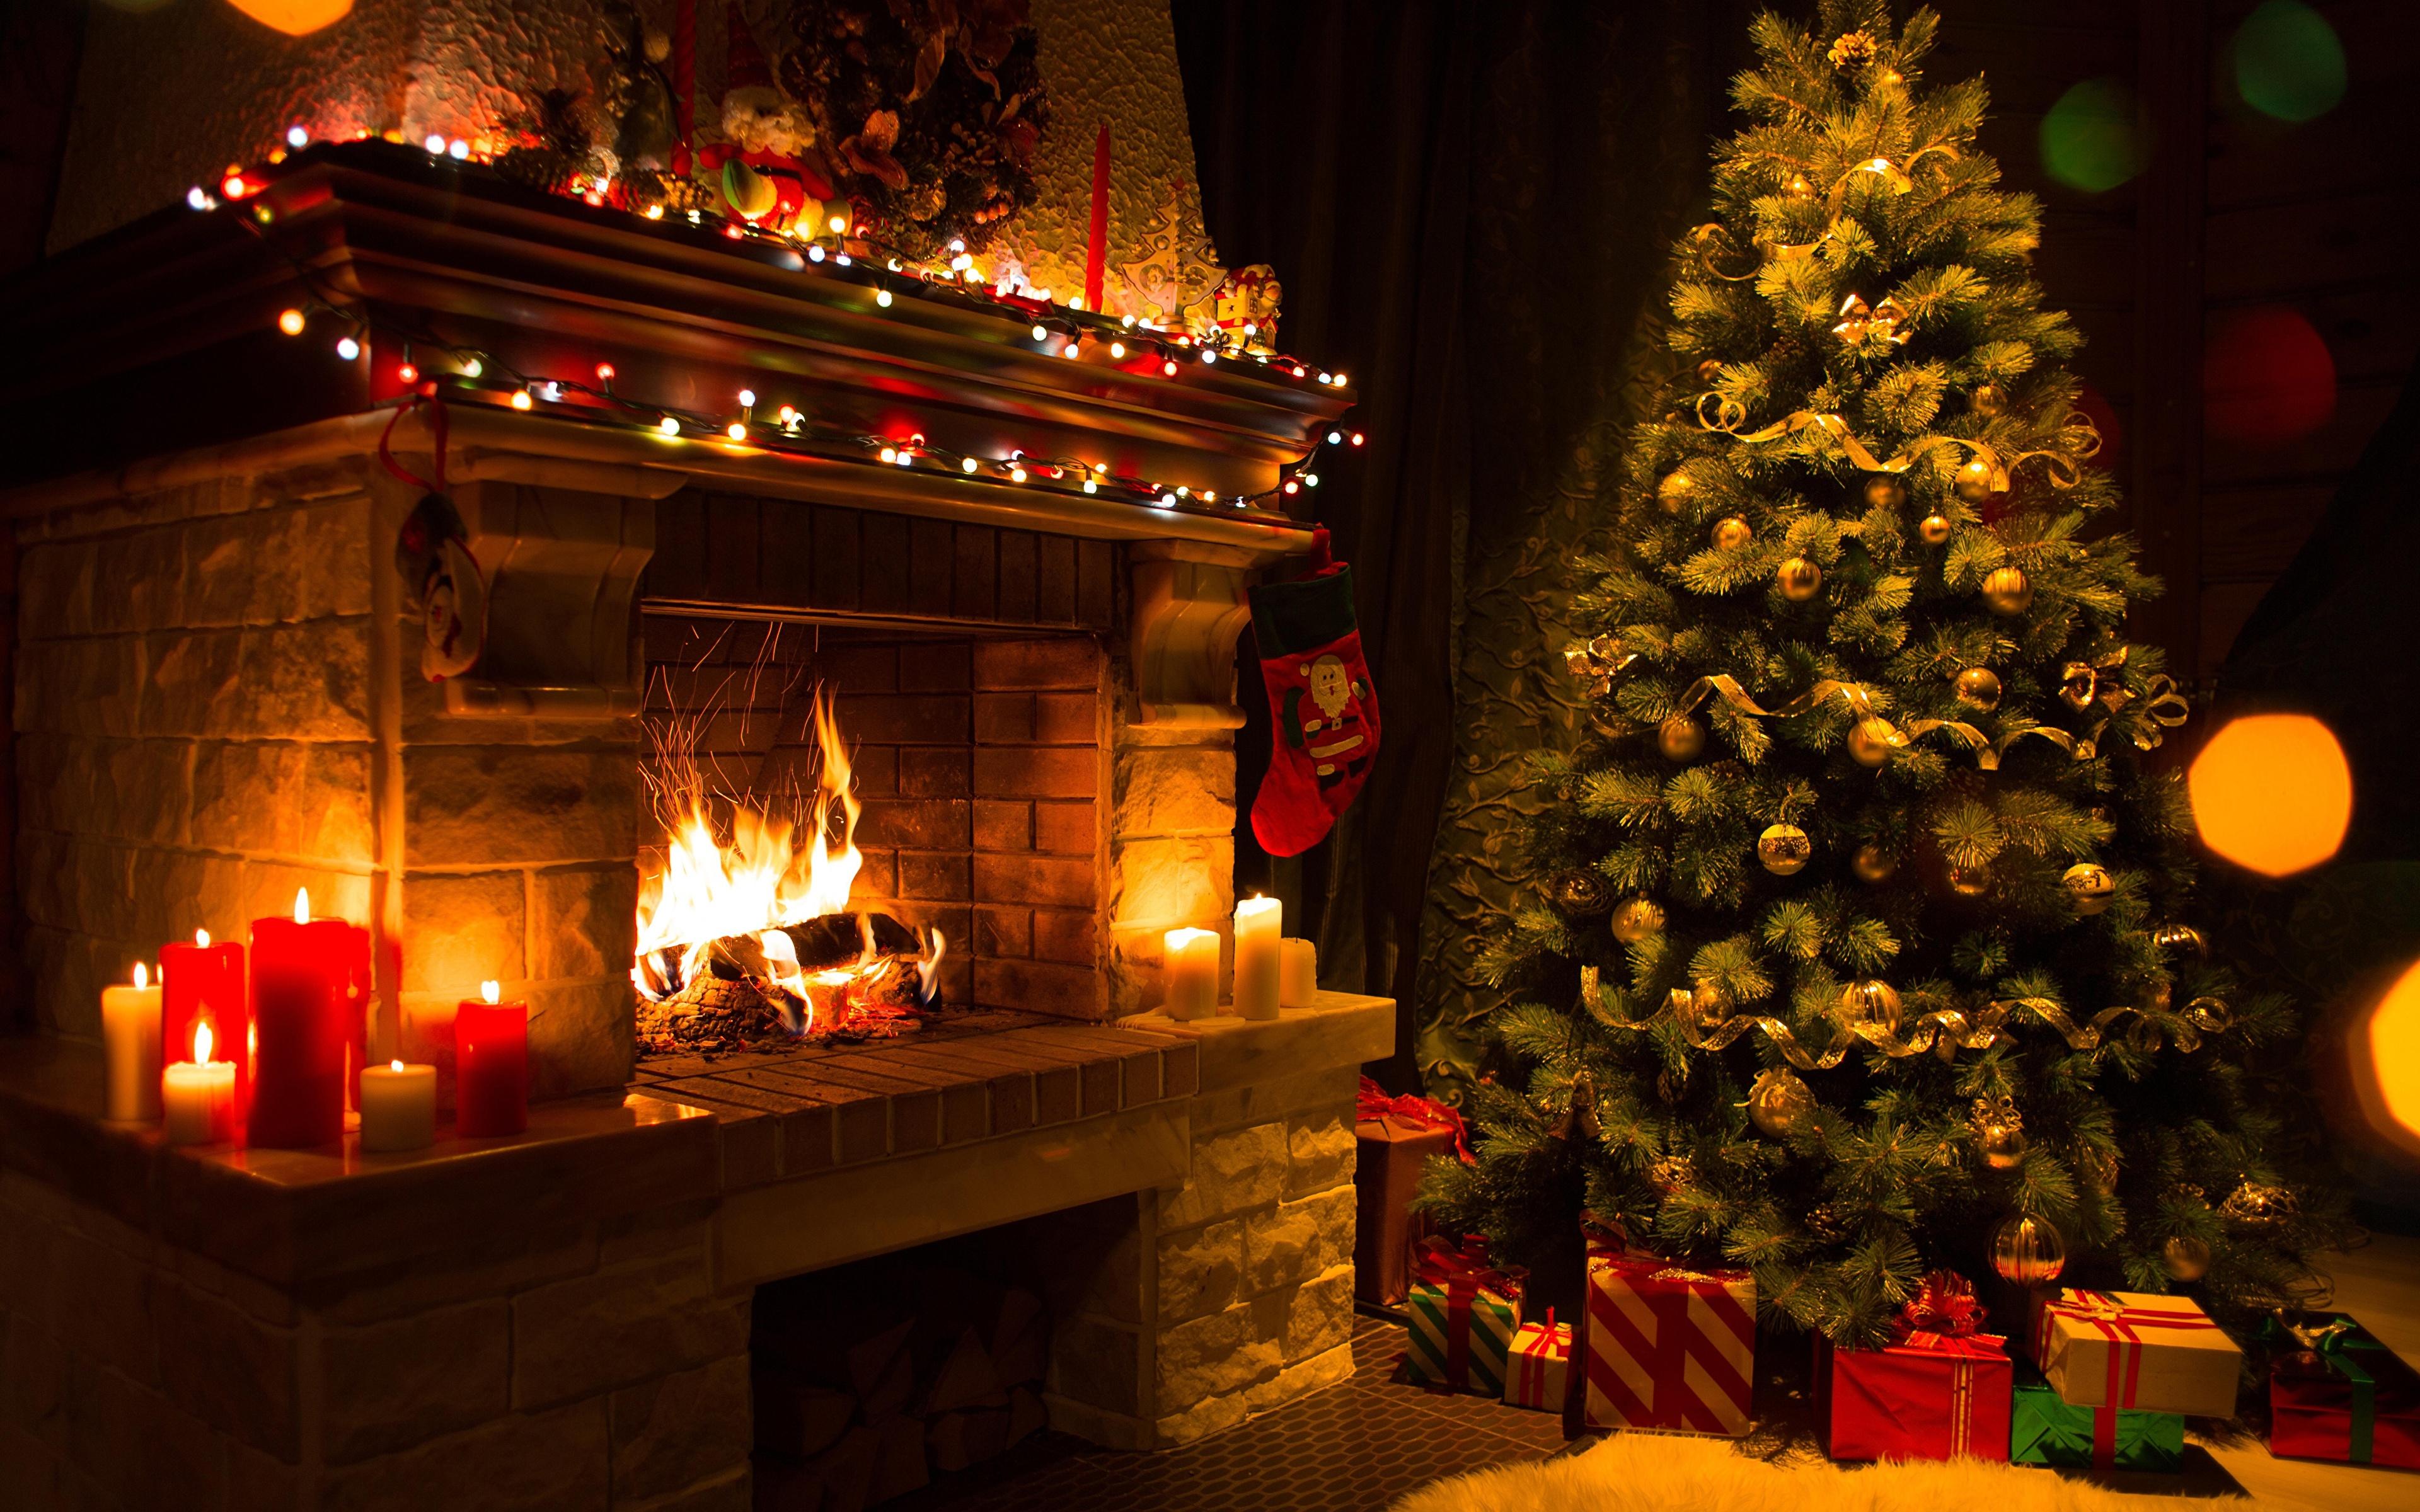 Photos New year Christmas tree Fire present Fireplace 3840x2400 3840x2400